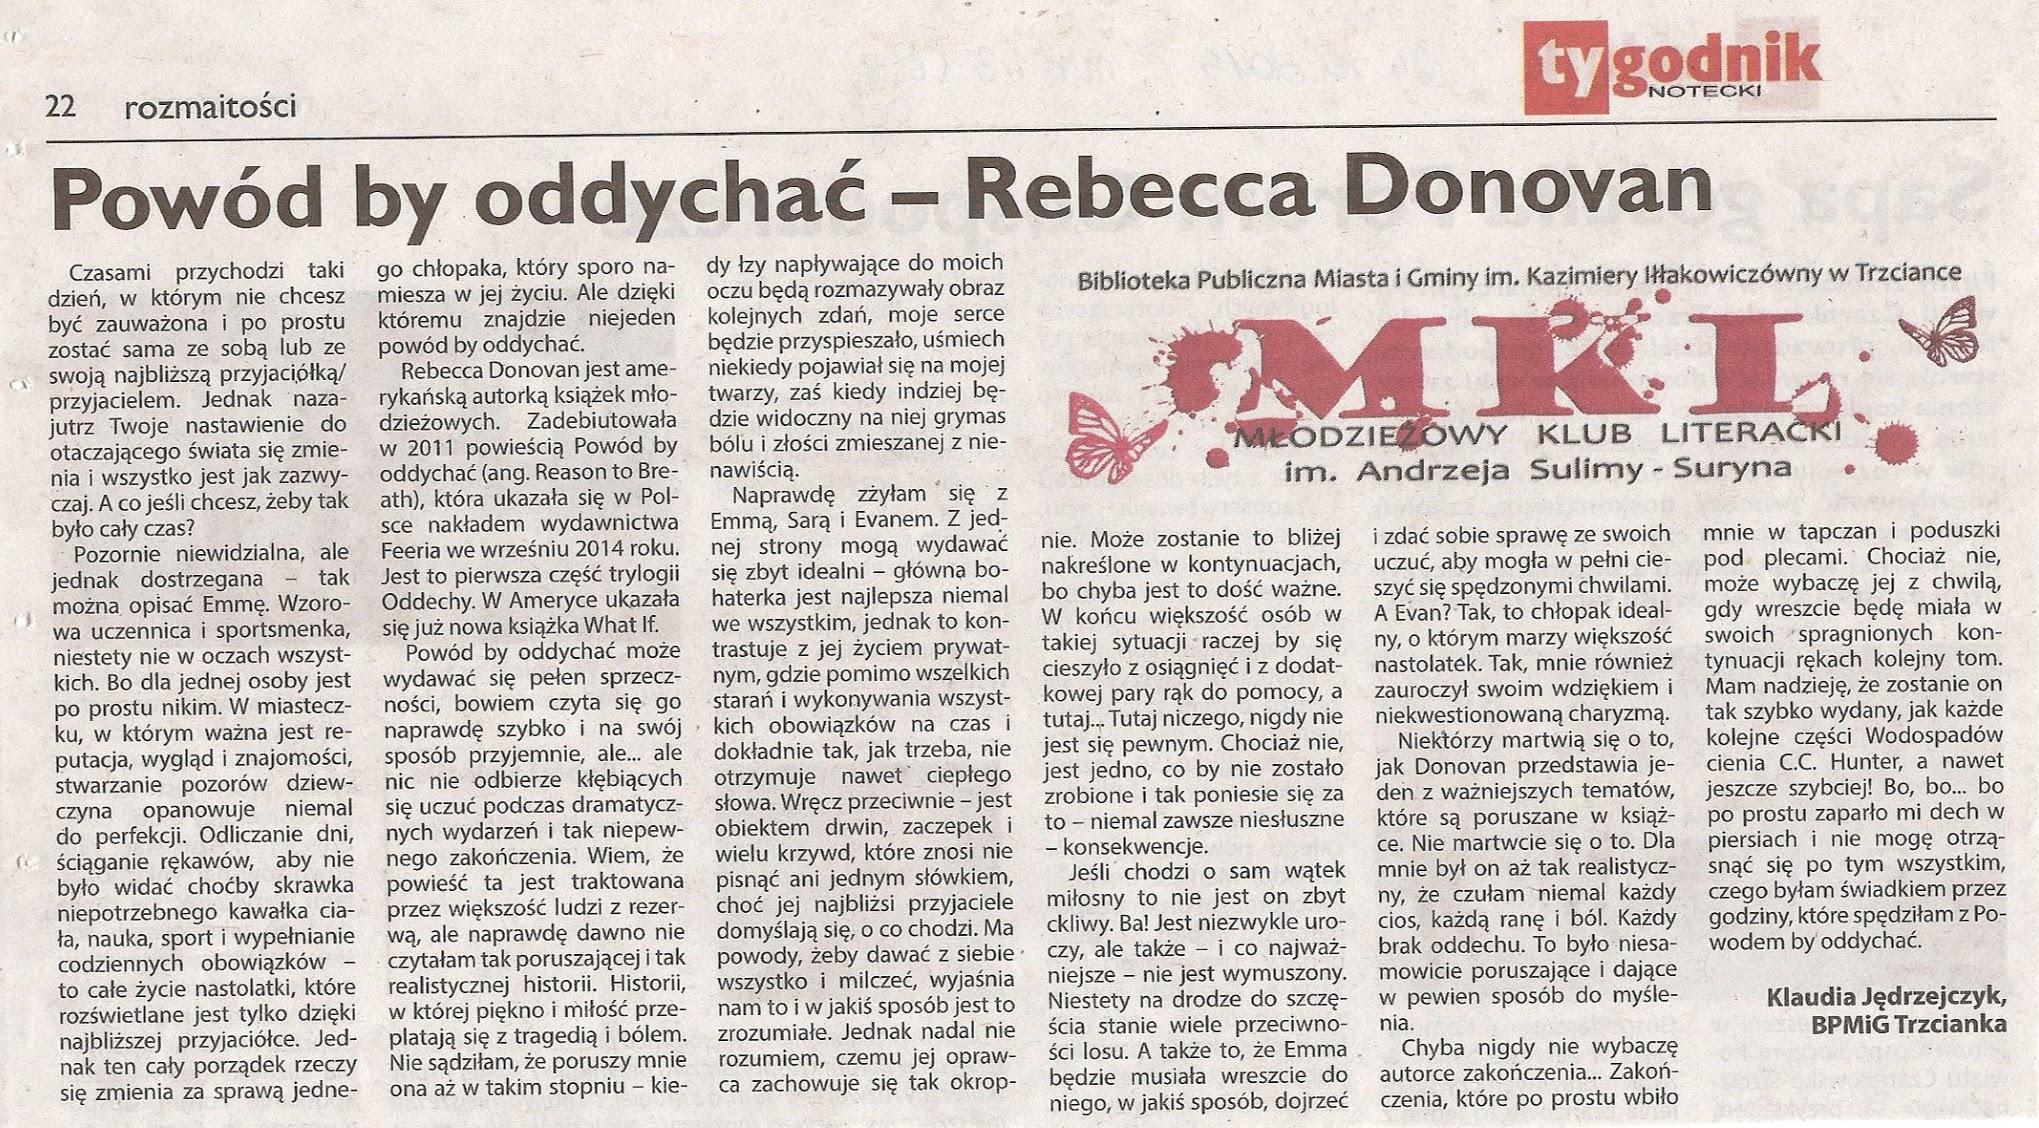 Photo: http://szeptksiazek.blogspot.com/2014/10/powod-by-oddychac-rebecca-donovan.html